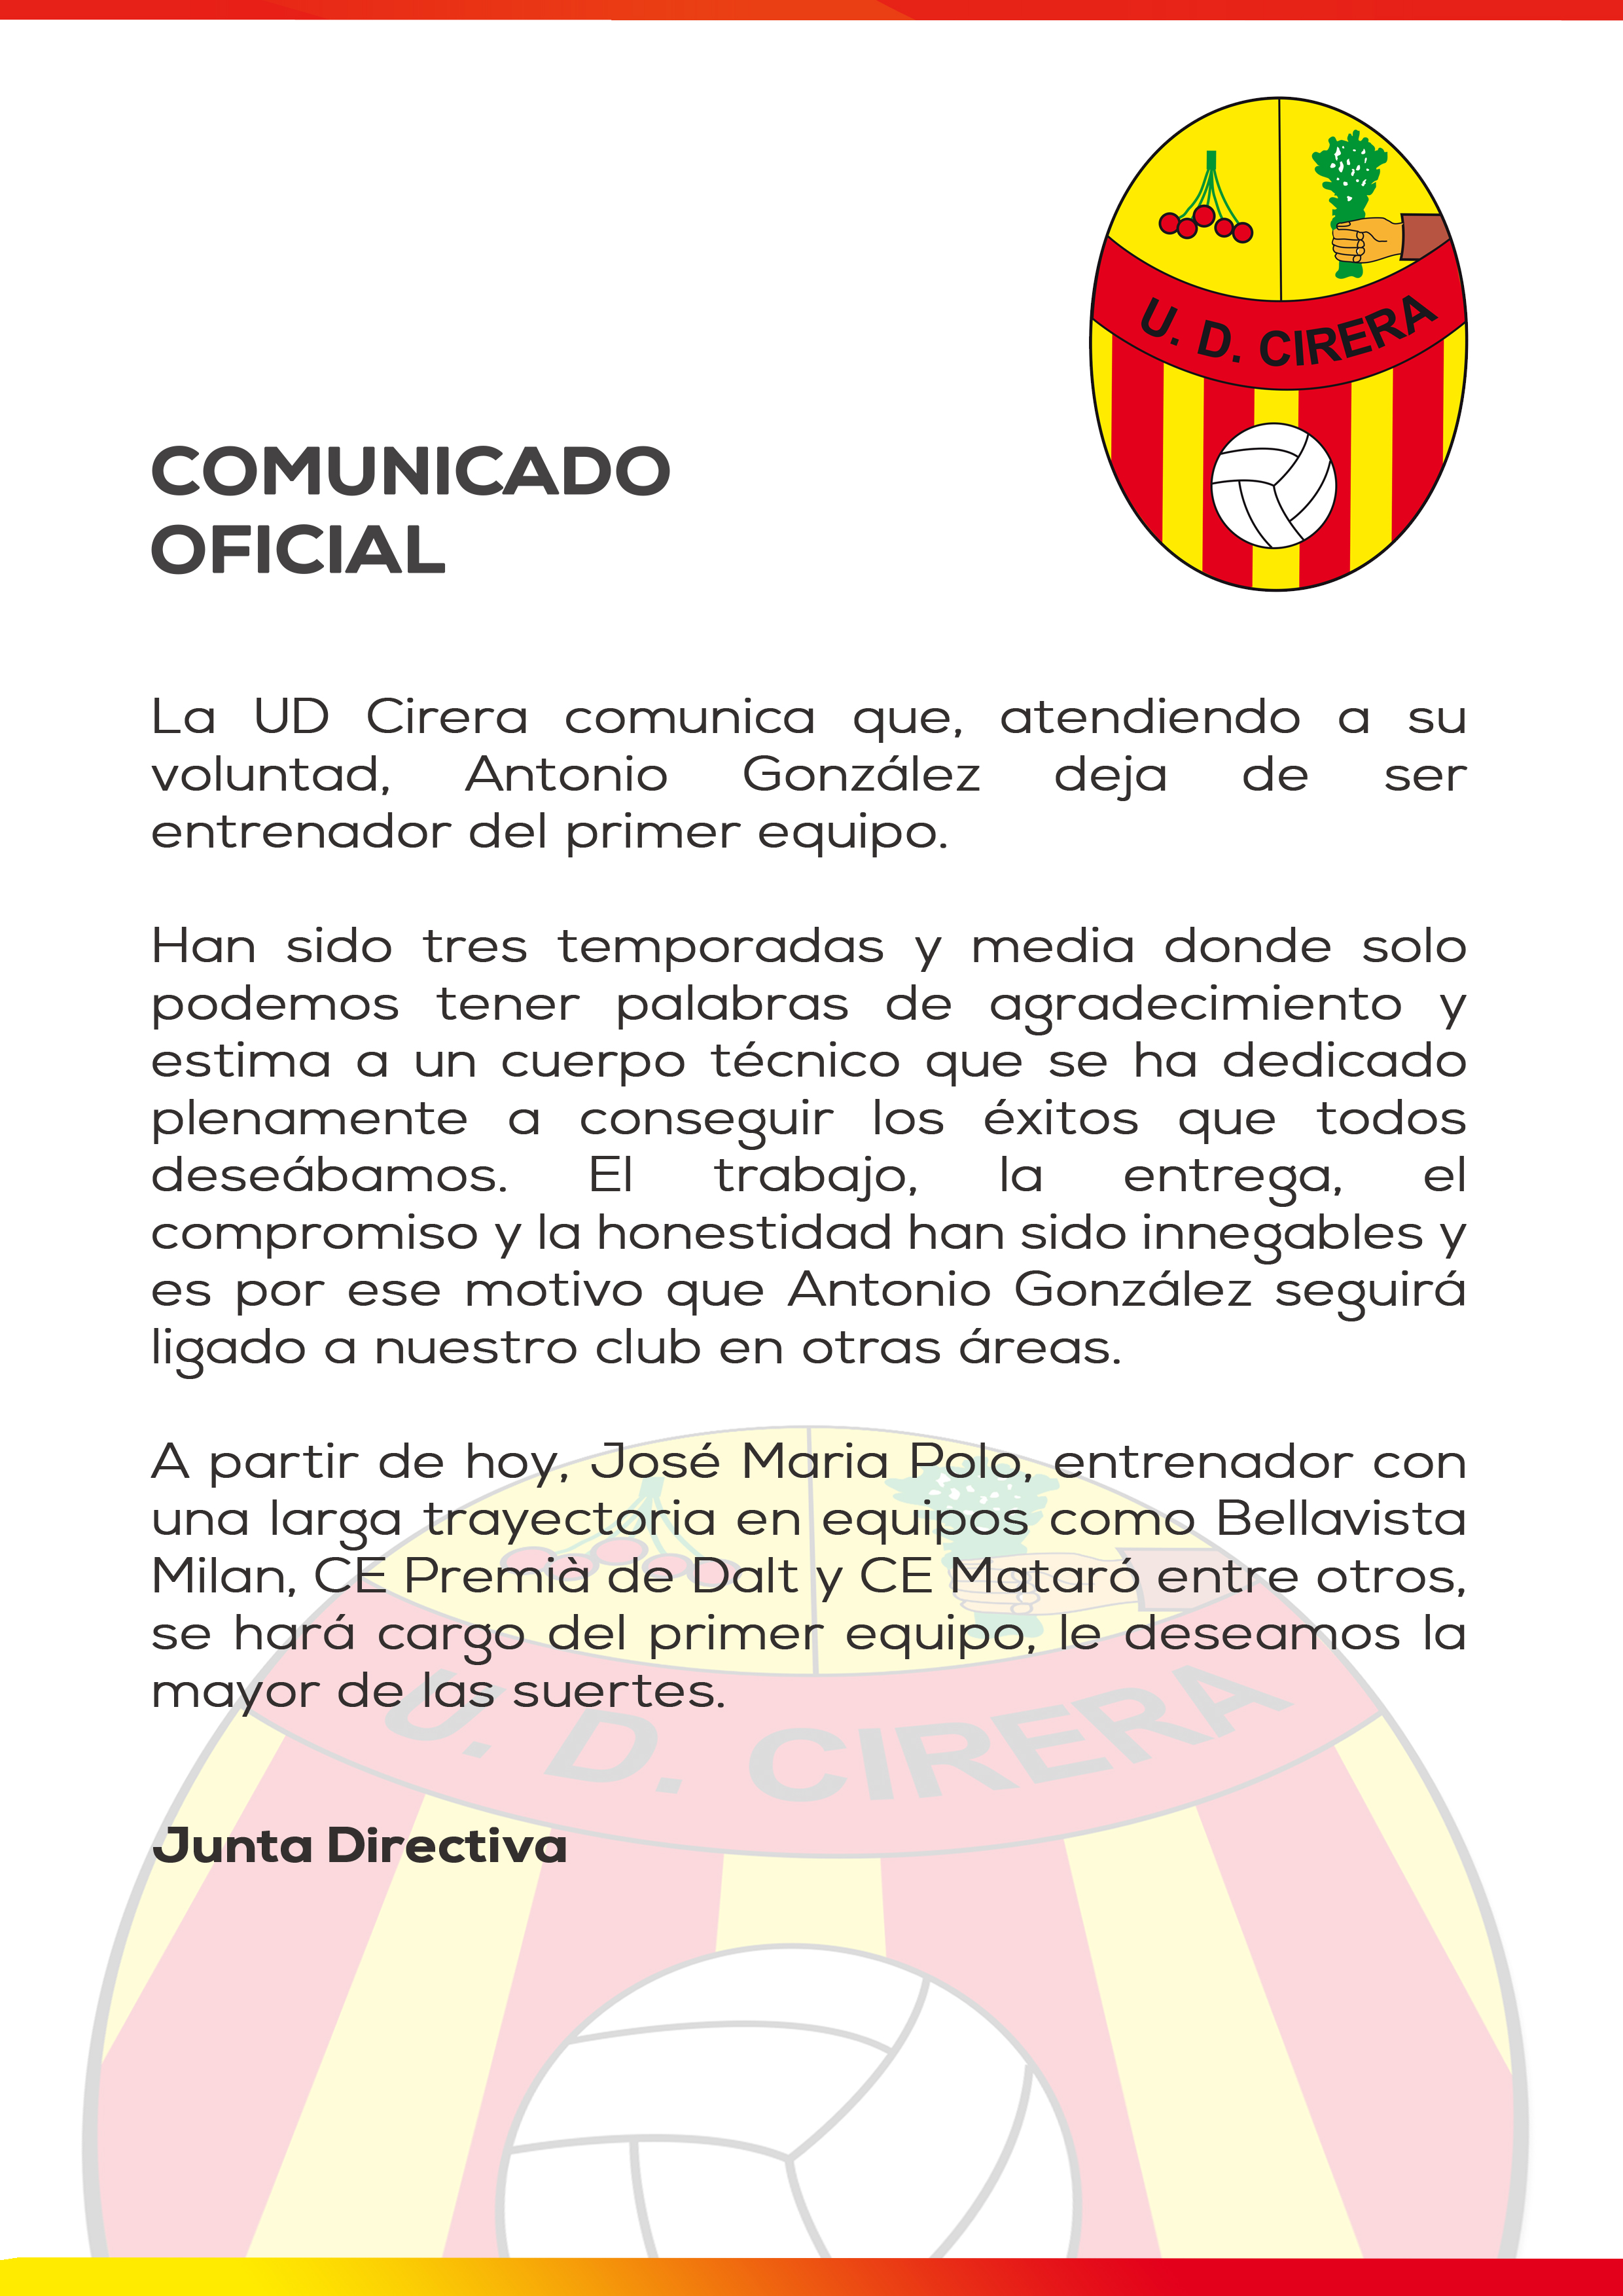 Comunicado Oficial_Antonio González